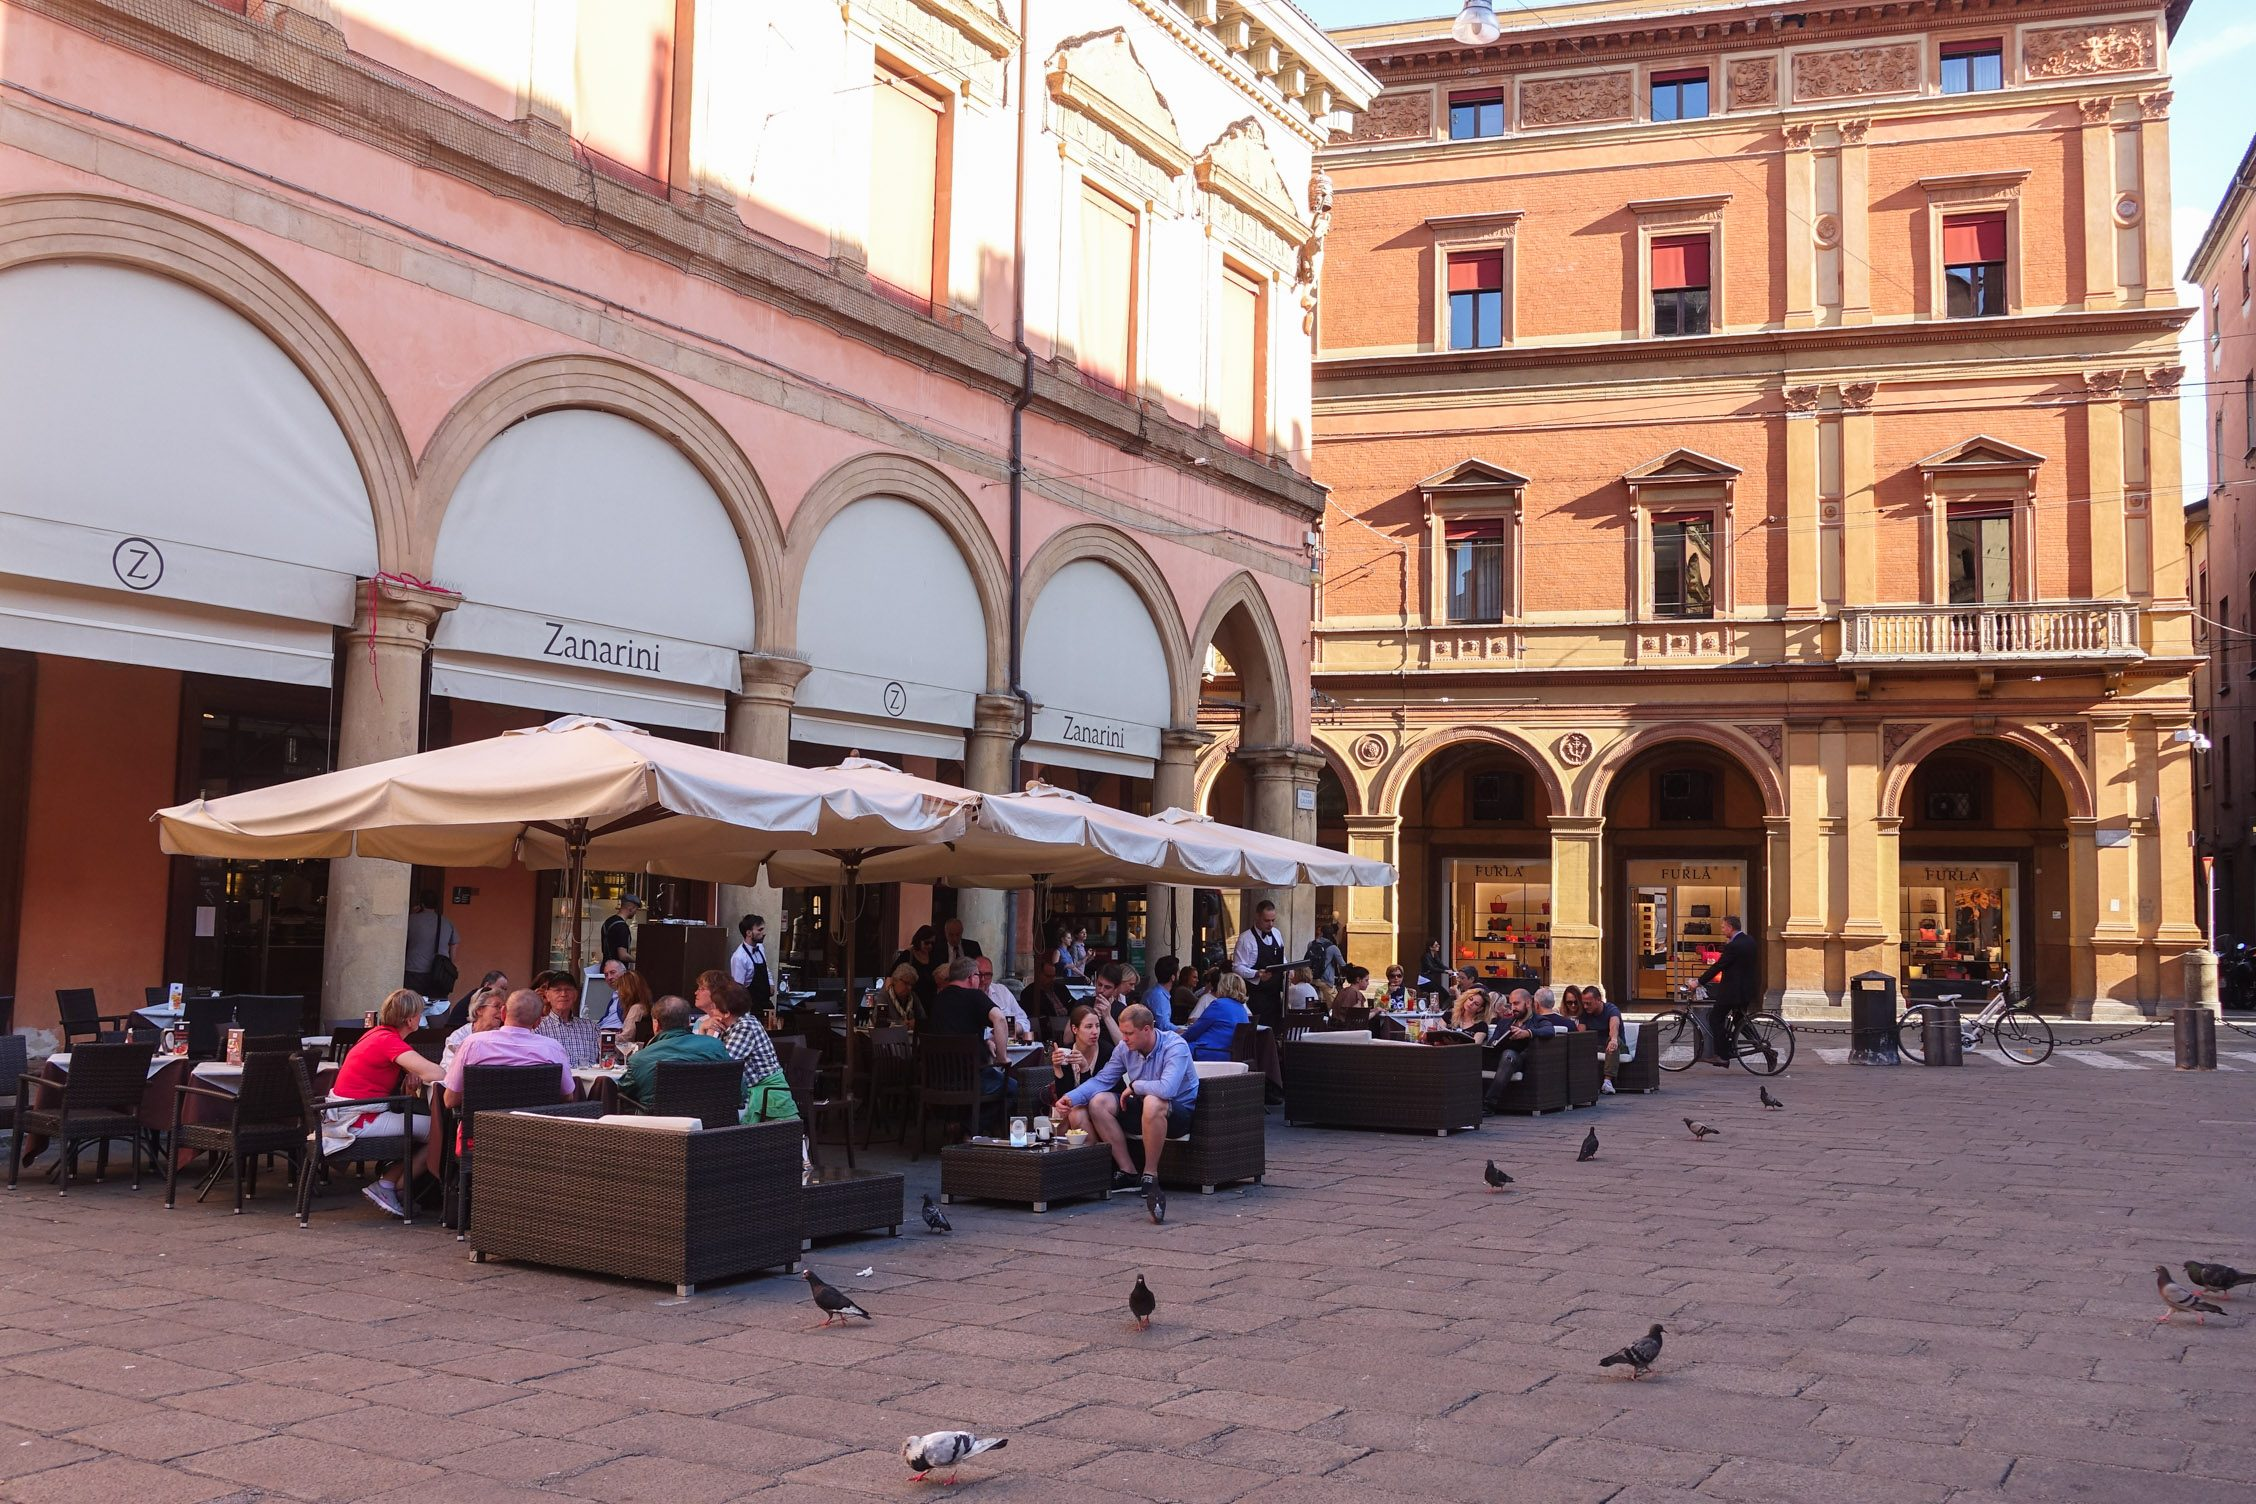 de Piazza Galvani